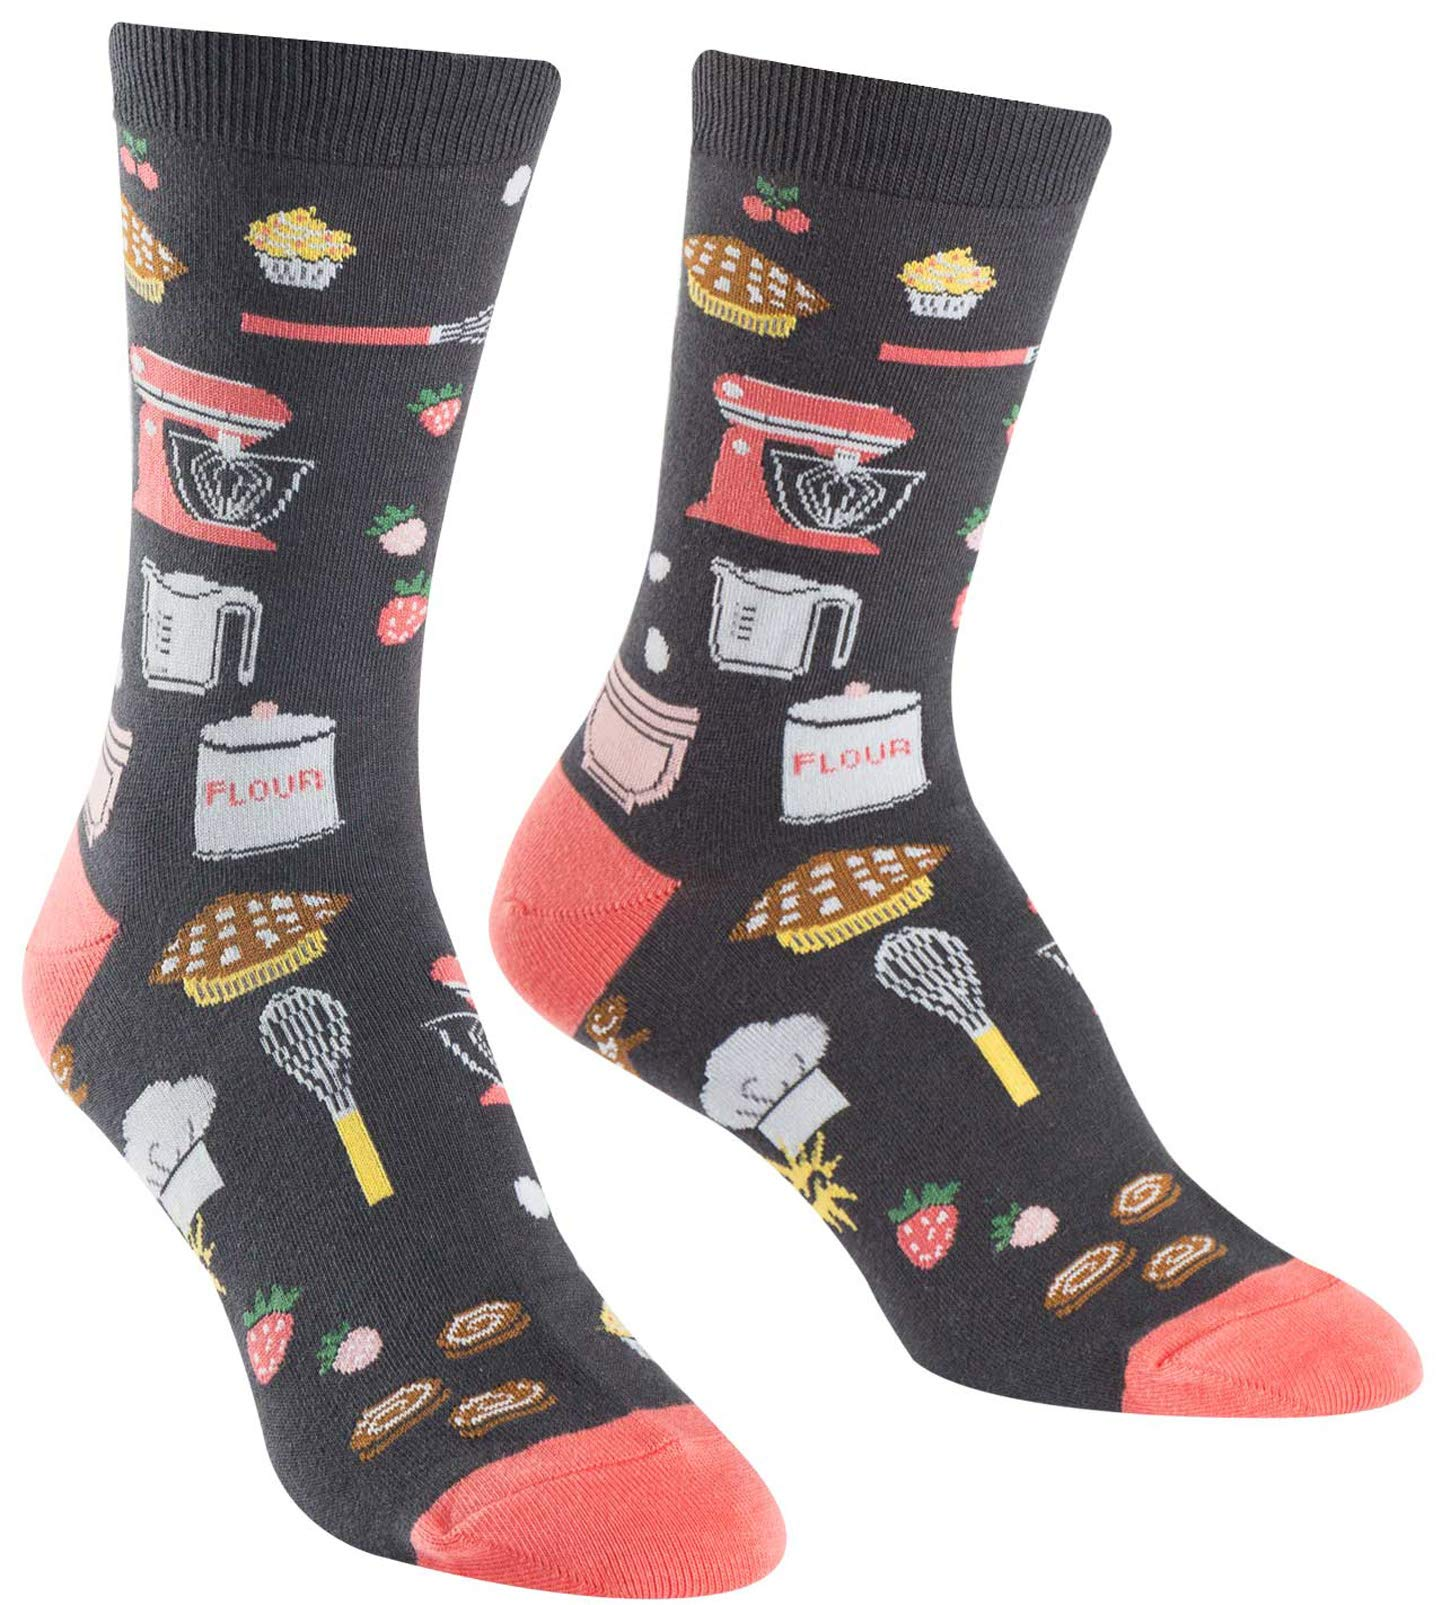 Sock It To Me, Whisking Business, Women's Crew Socks, Kitchen Food Socks